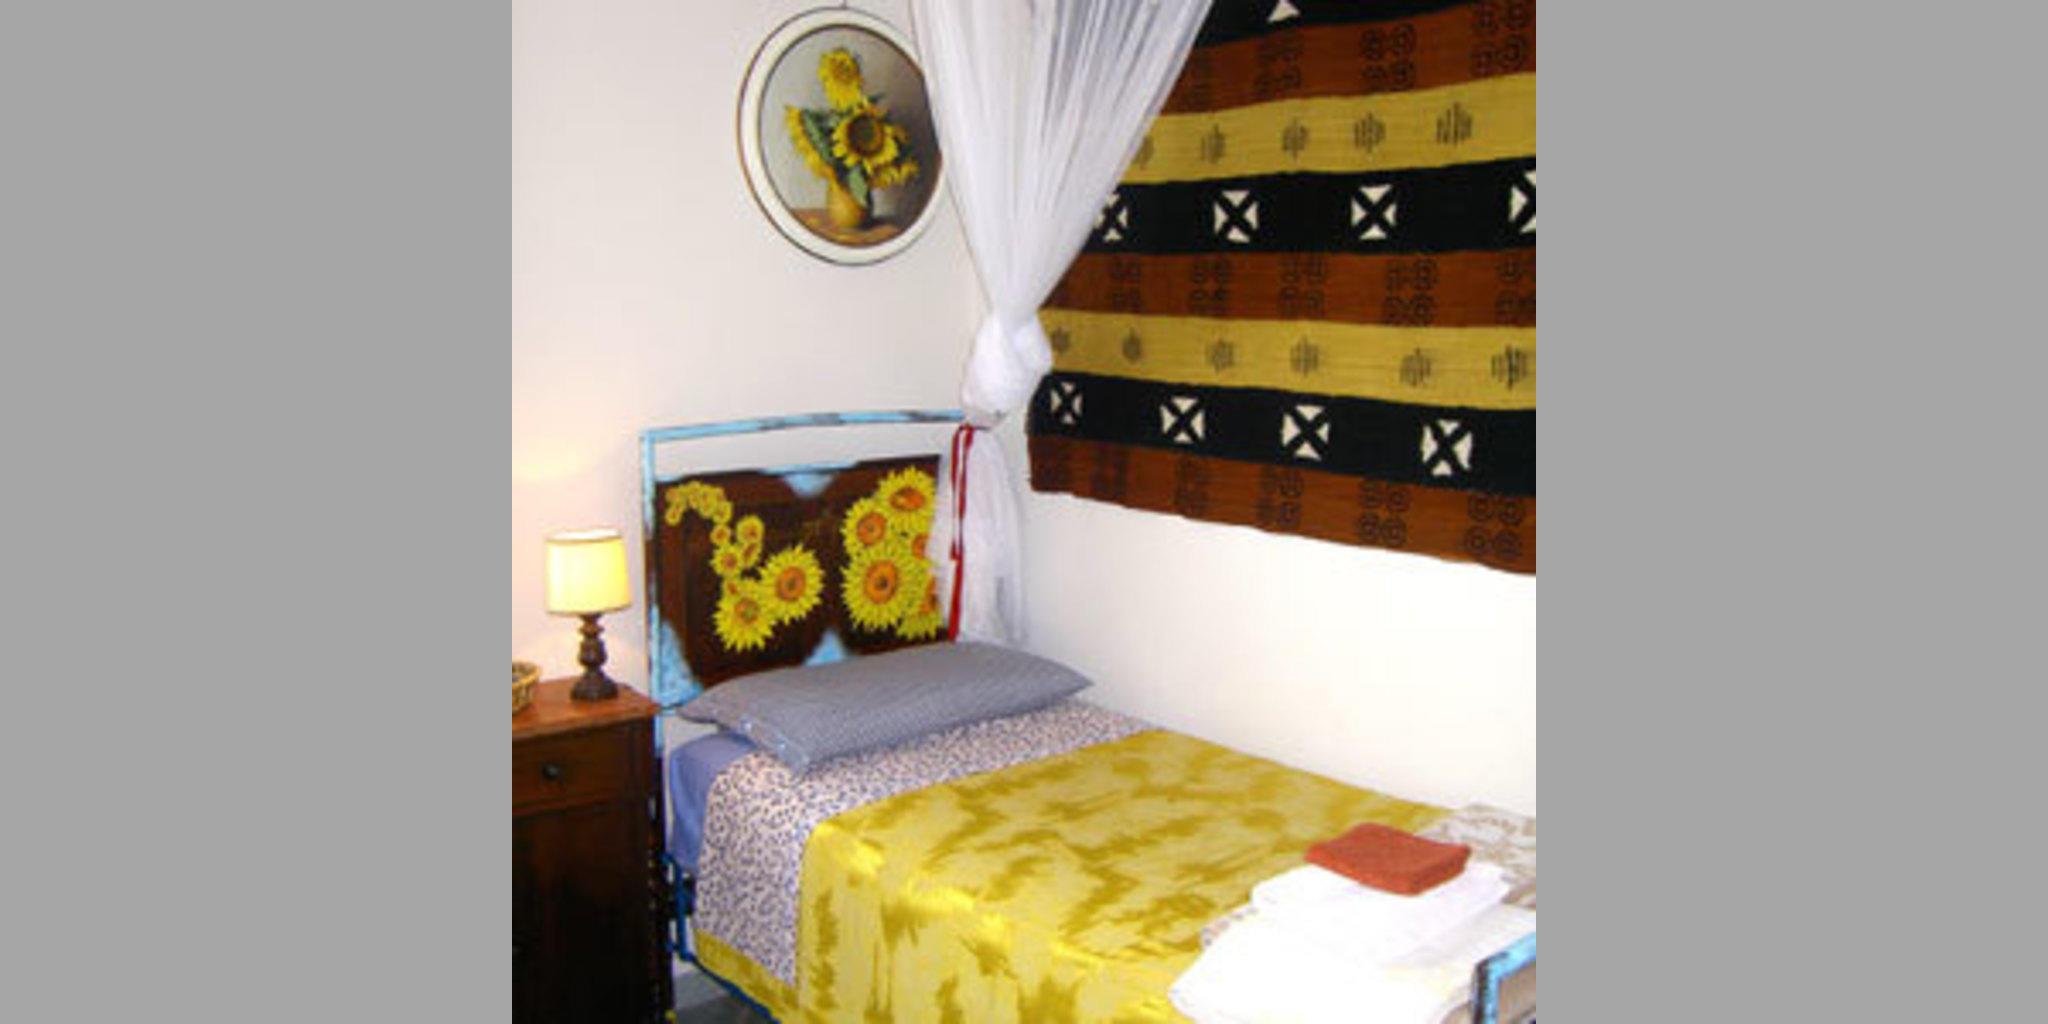 Bed & Breakfast Barberino Val D'Elsa - Chianti_Bagnoli